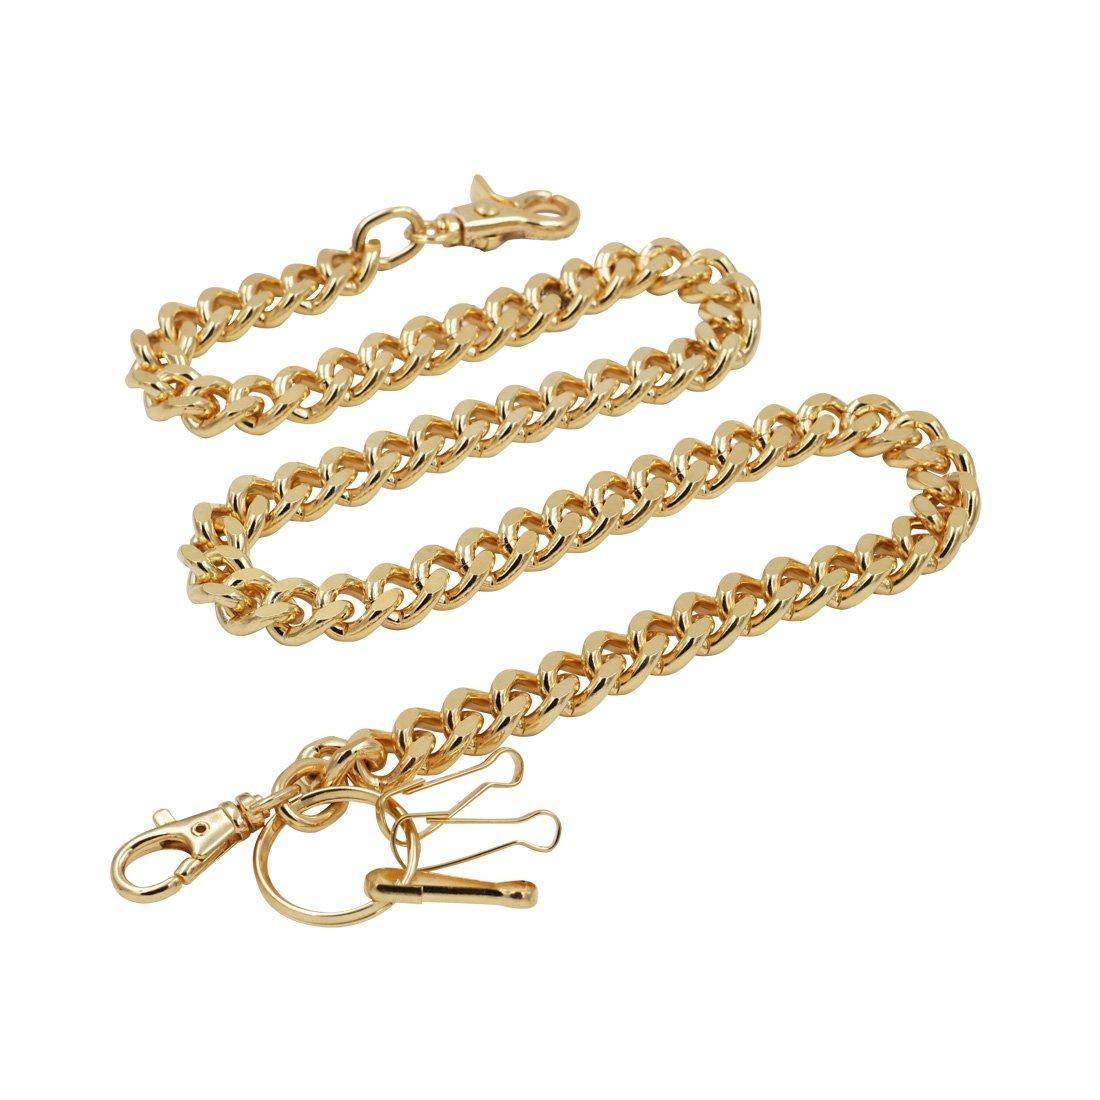 Heavy Thick Curb Cuban Link wallet chain Biker Punk Key chain (31